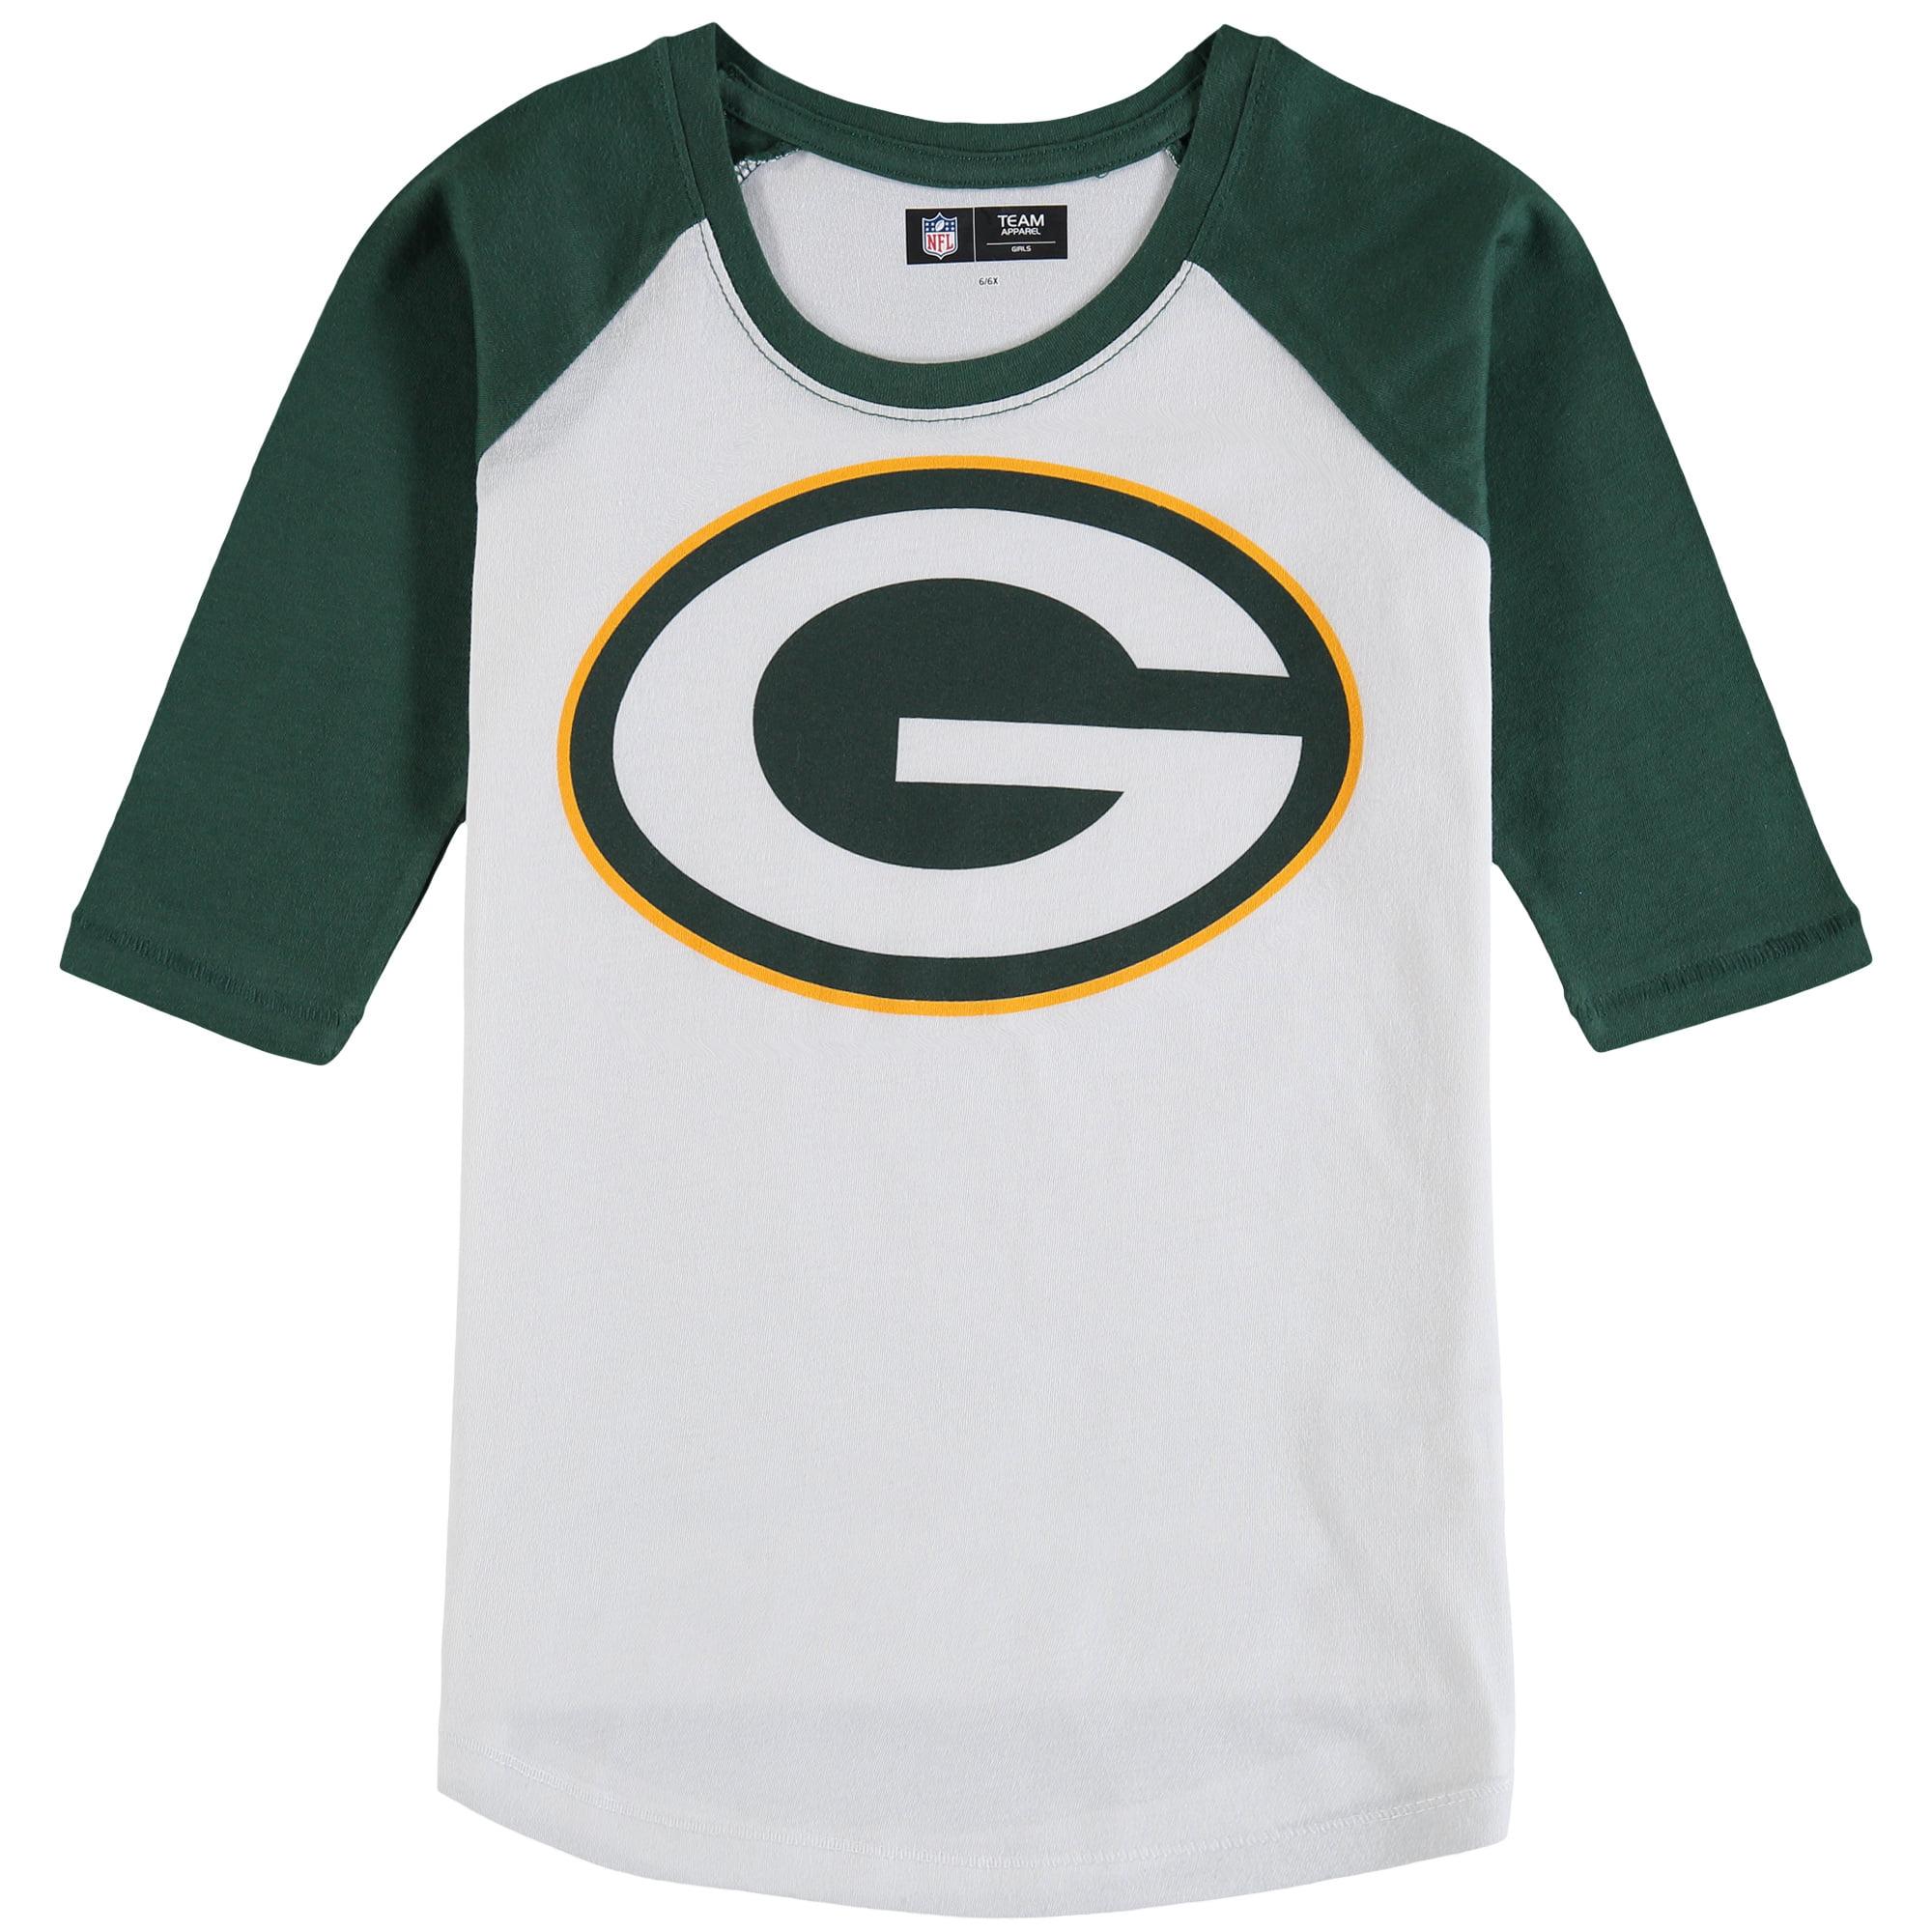 Green Bay Packers 5th & Ocean by New Era Girls Youth 3/4-Sleeve Raglan T-Shirt - White/Green